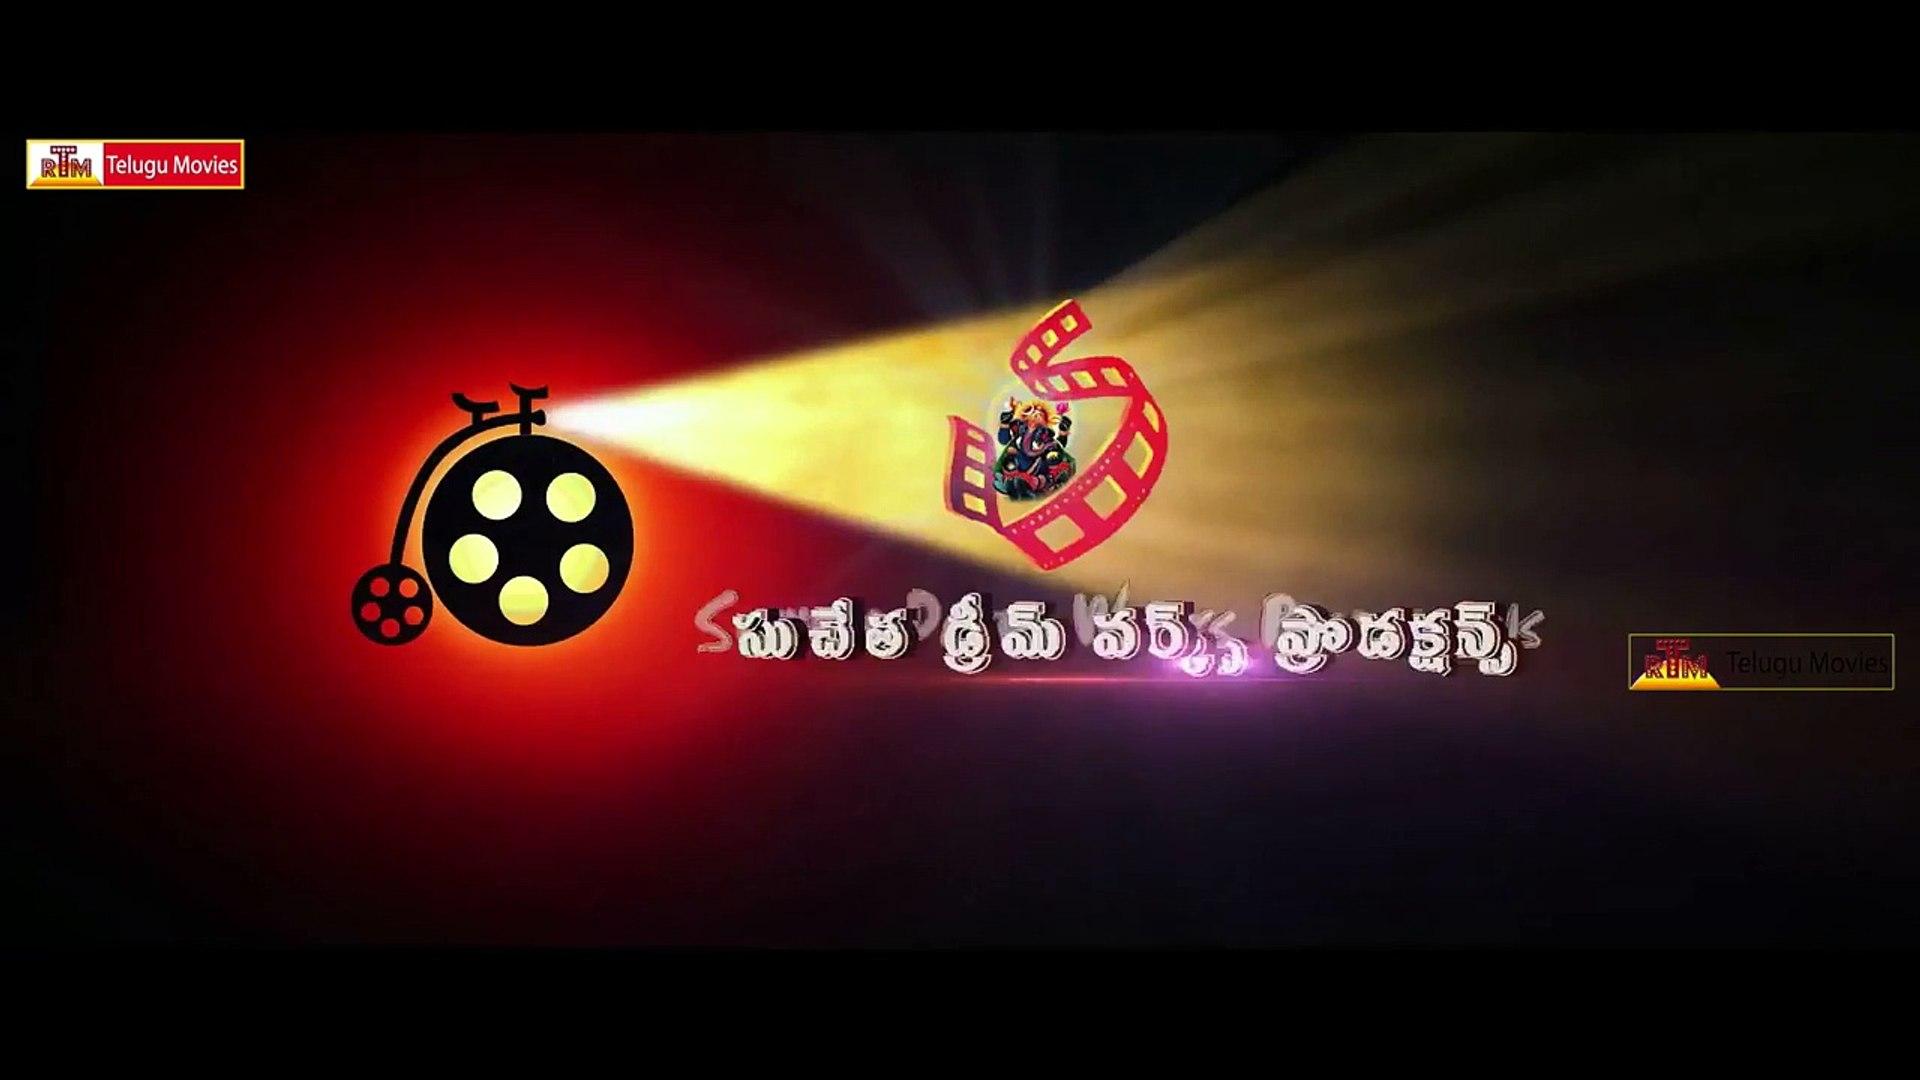 Plus One Movie Trailer 3 - New Movie Trailer 2016 | Latest Telugu Movie